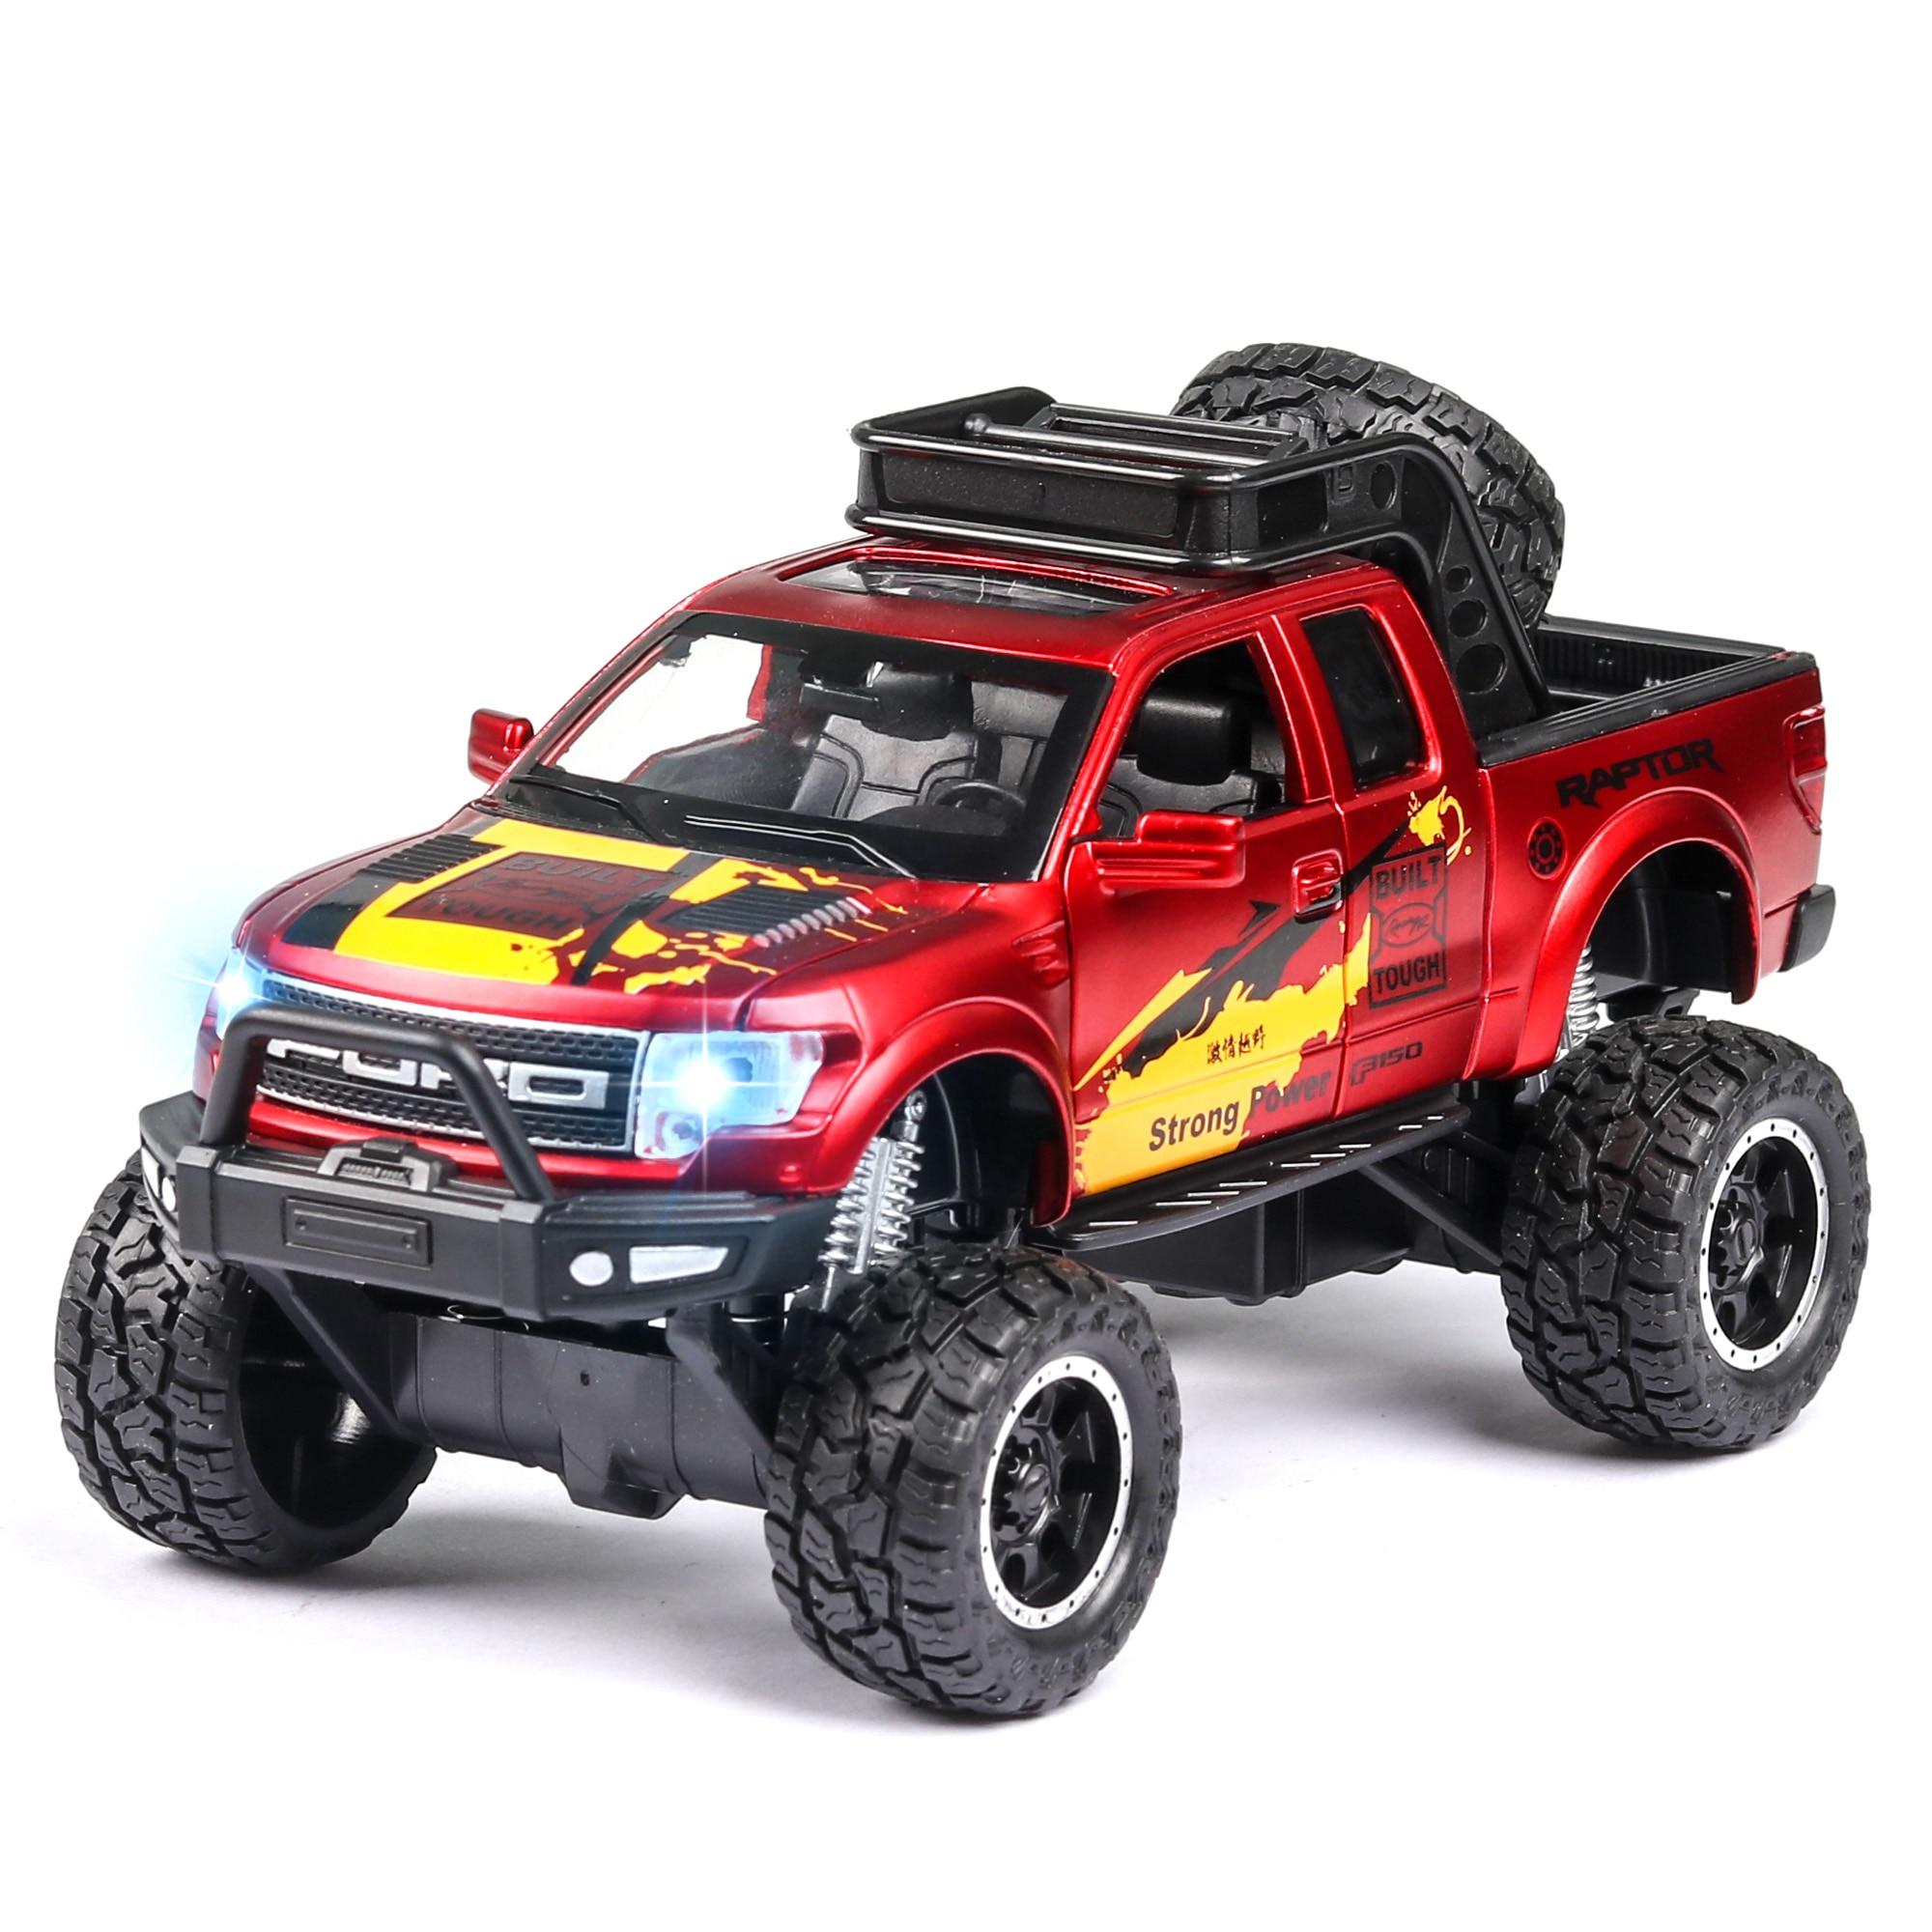 1:32 Diecast Metal Model Car FORO RAPTOR F150 Off-road Shockproof Toy Wheels Alloy Vehicle Sound Light Pull Back Car Boy Kid Toy